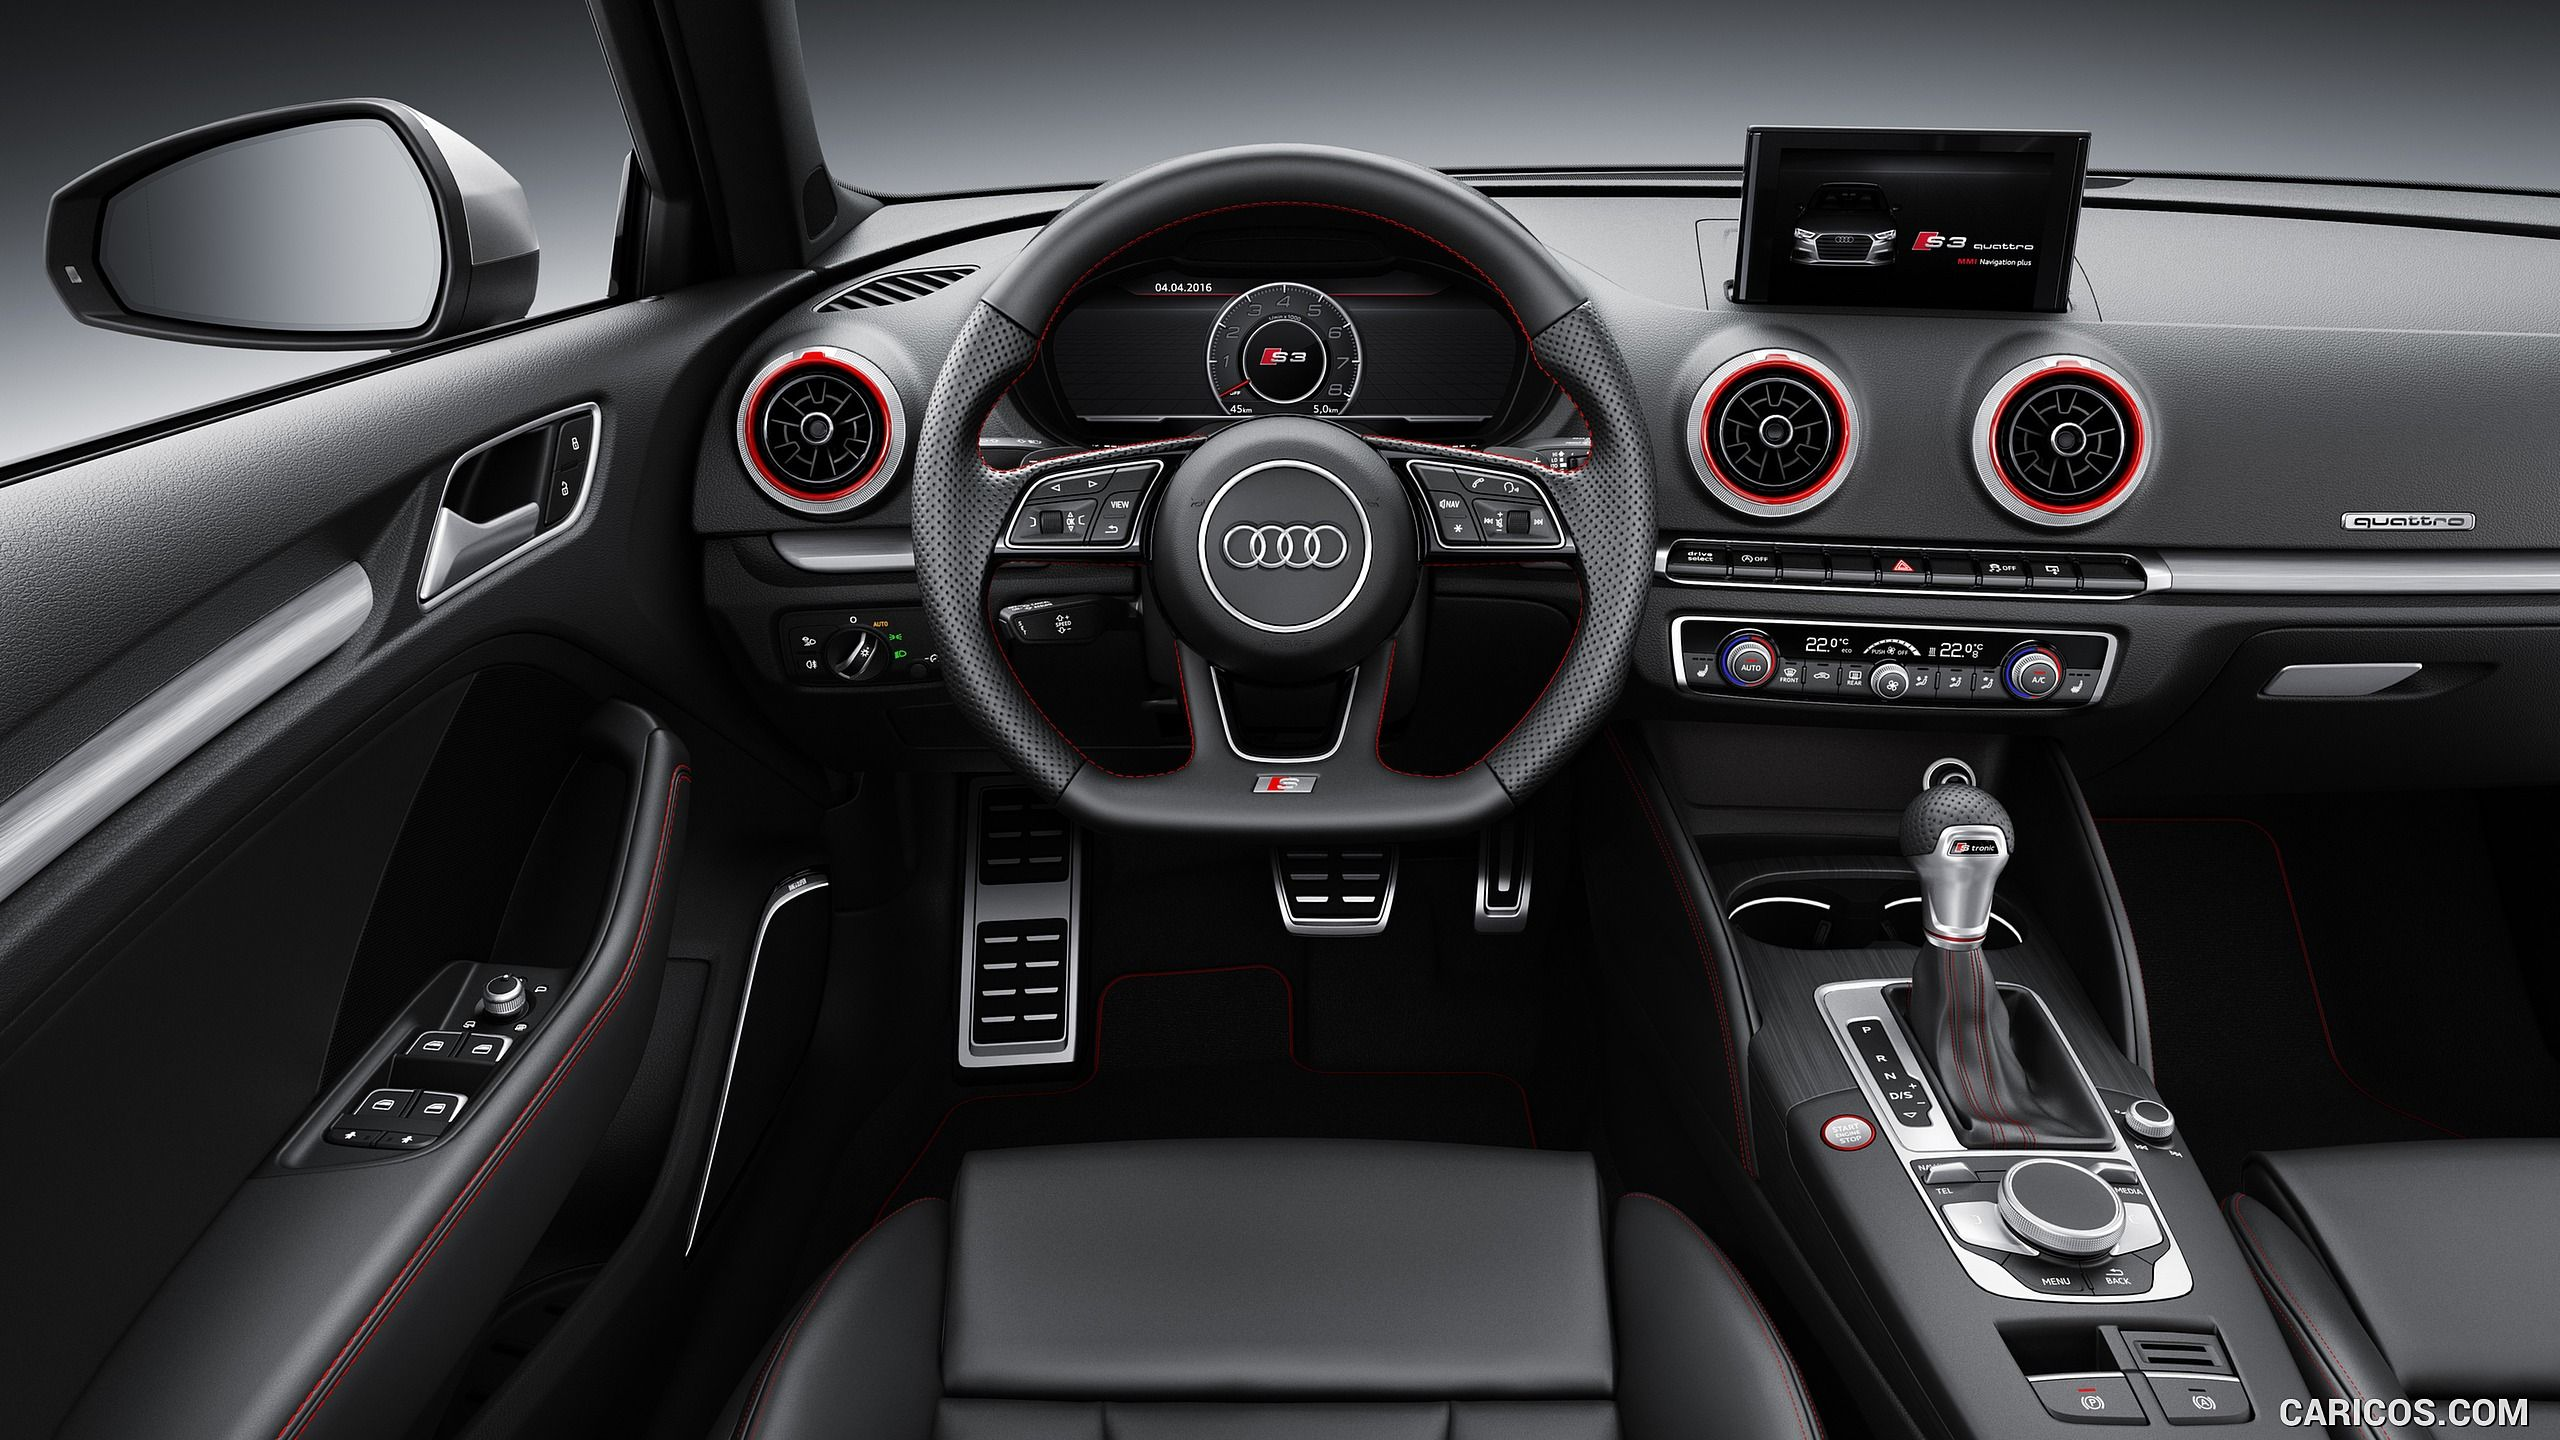 2017 Audi S3 Sportback Wallpaper Ford Mustang Ecoboost Mustang